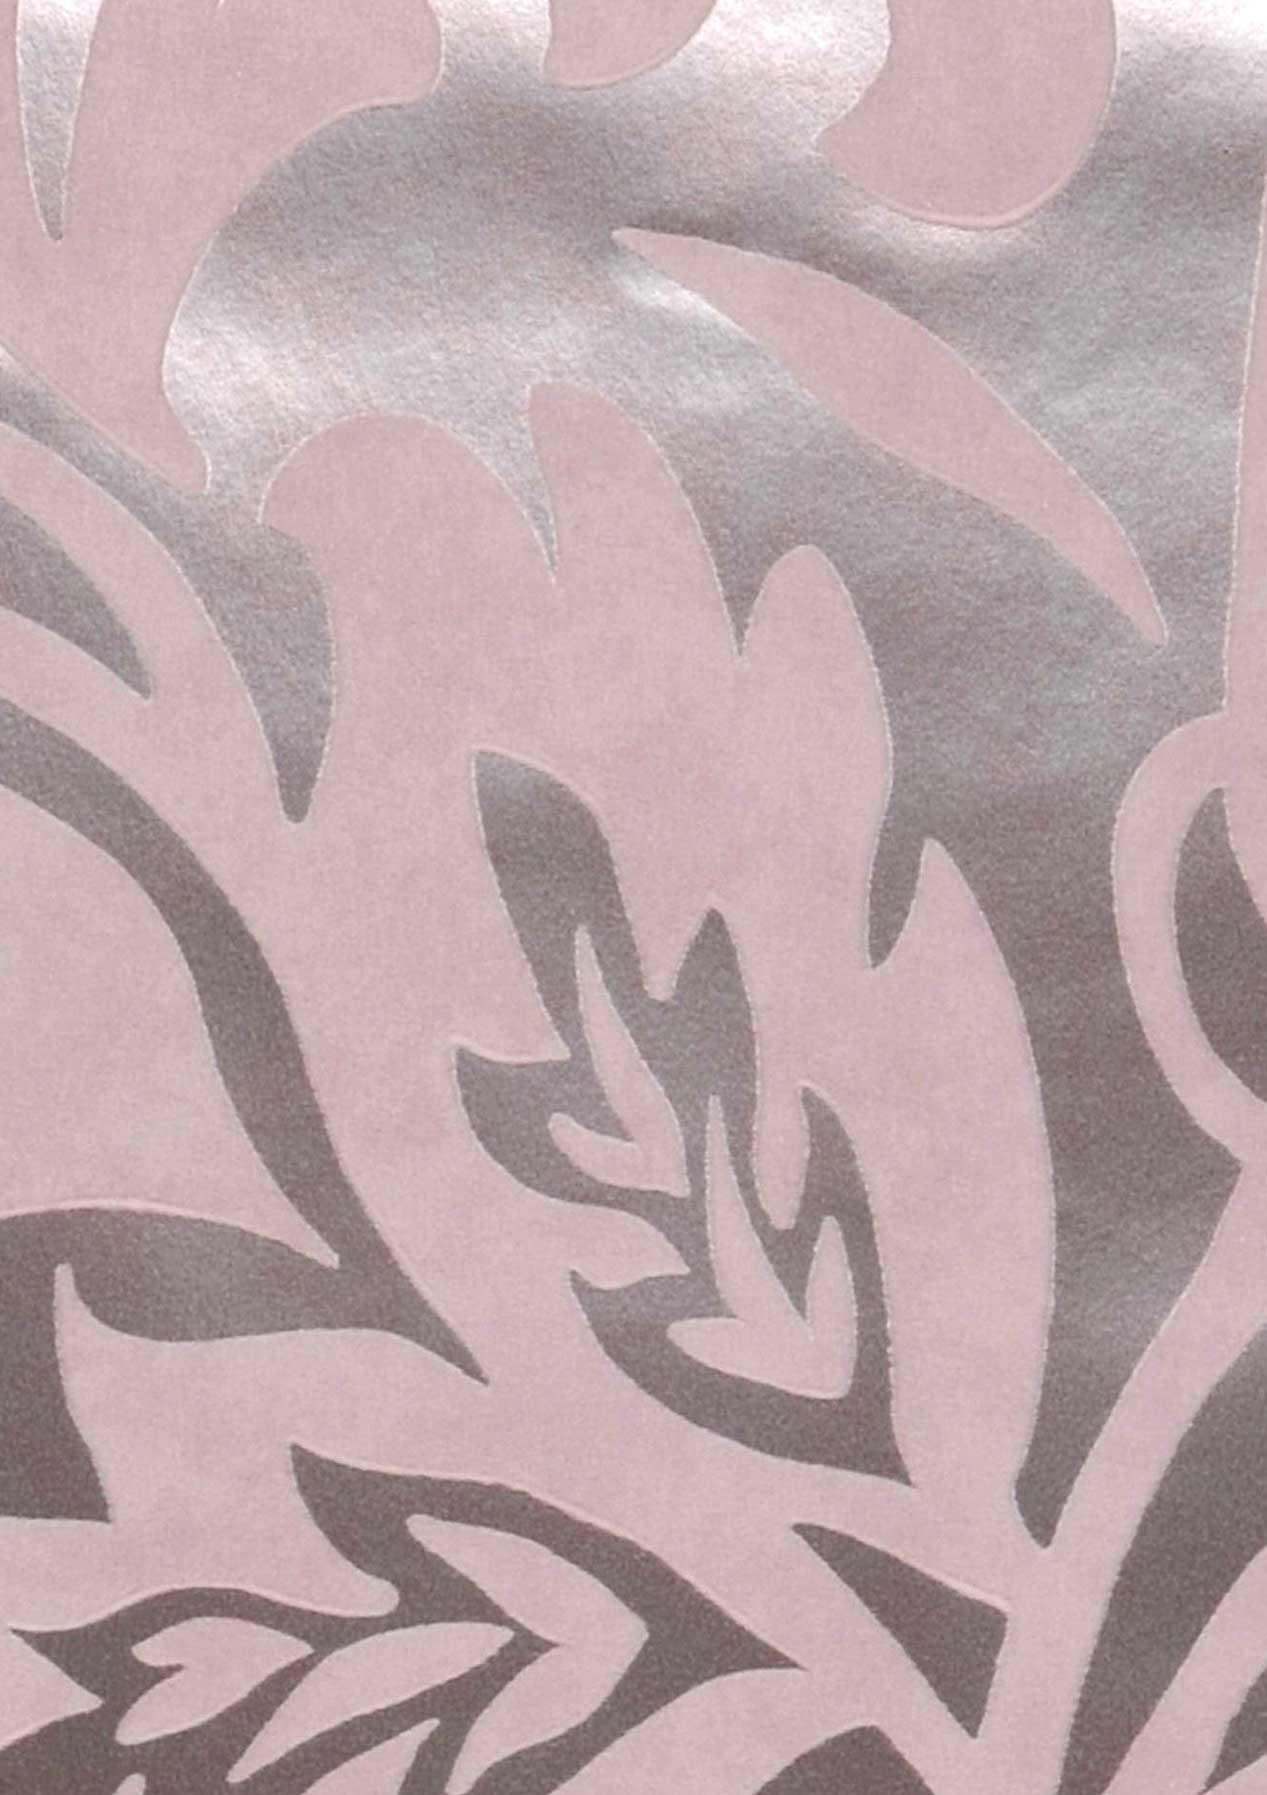 Carta da parati aphrodite argento rosa pallido carta for Carta da parati anni 70 vendita on line